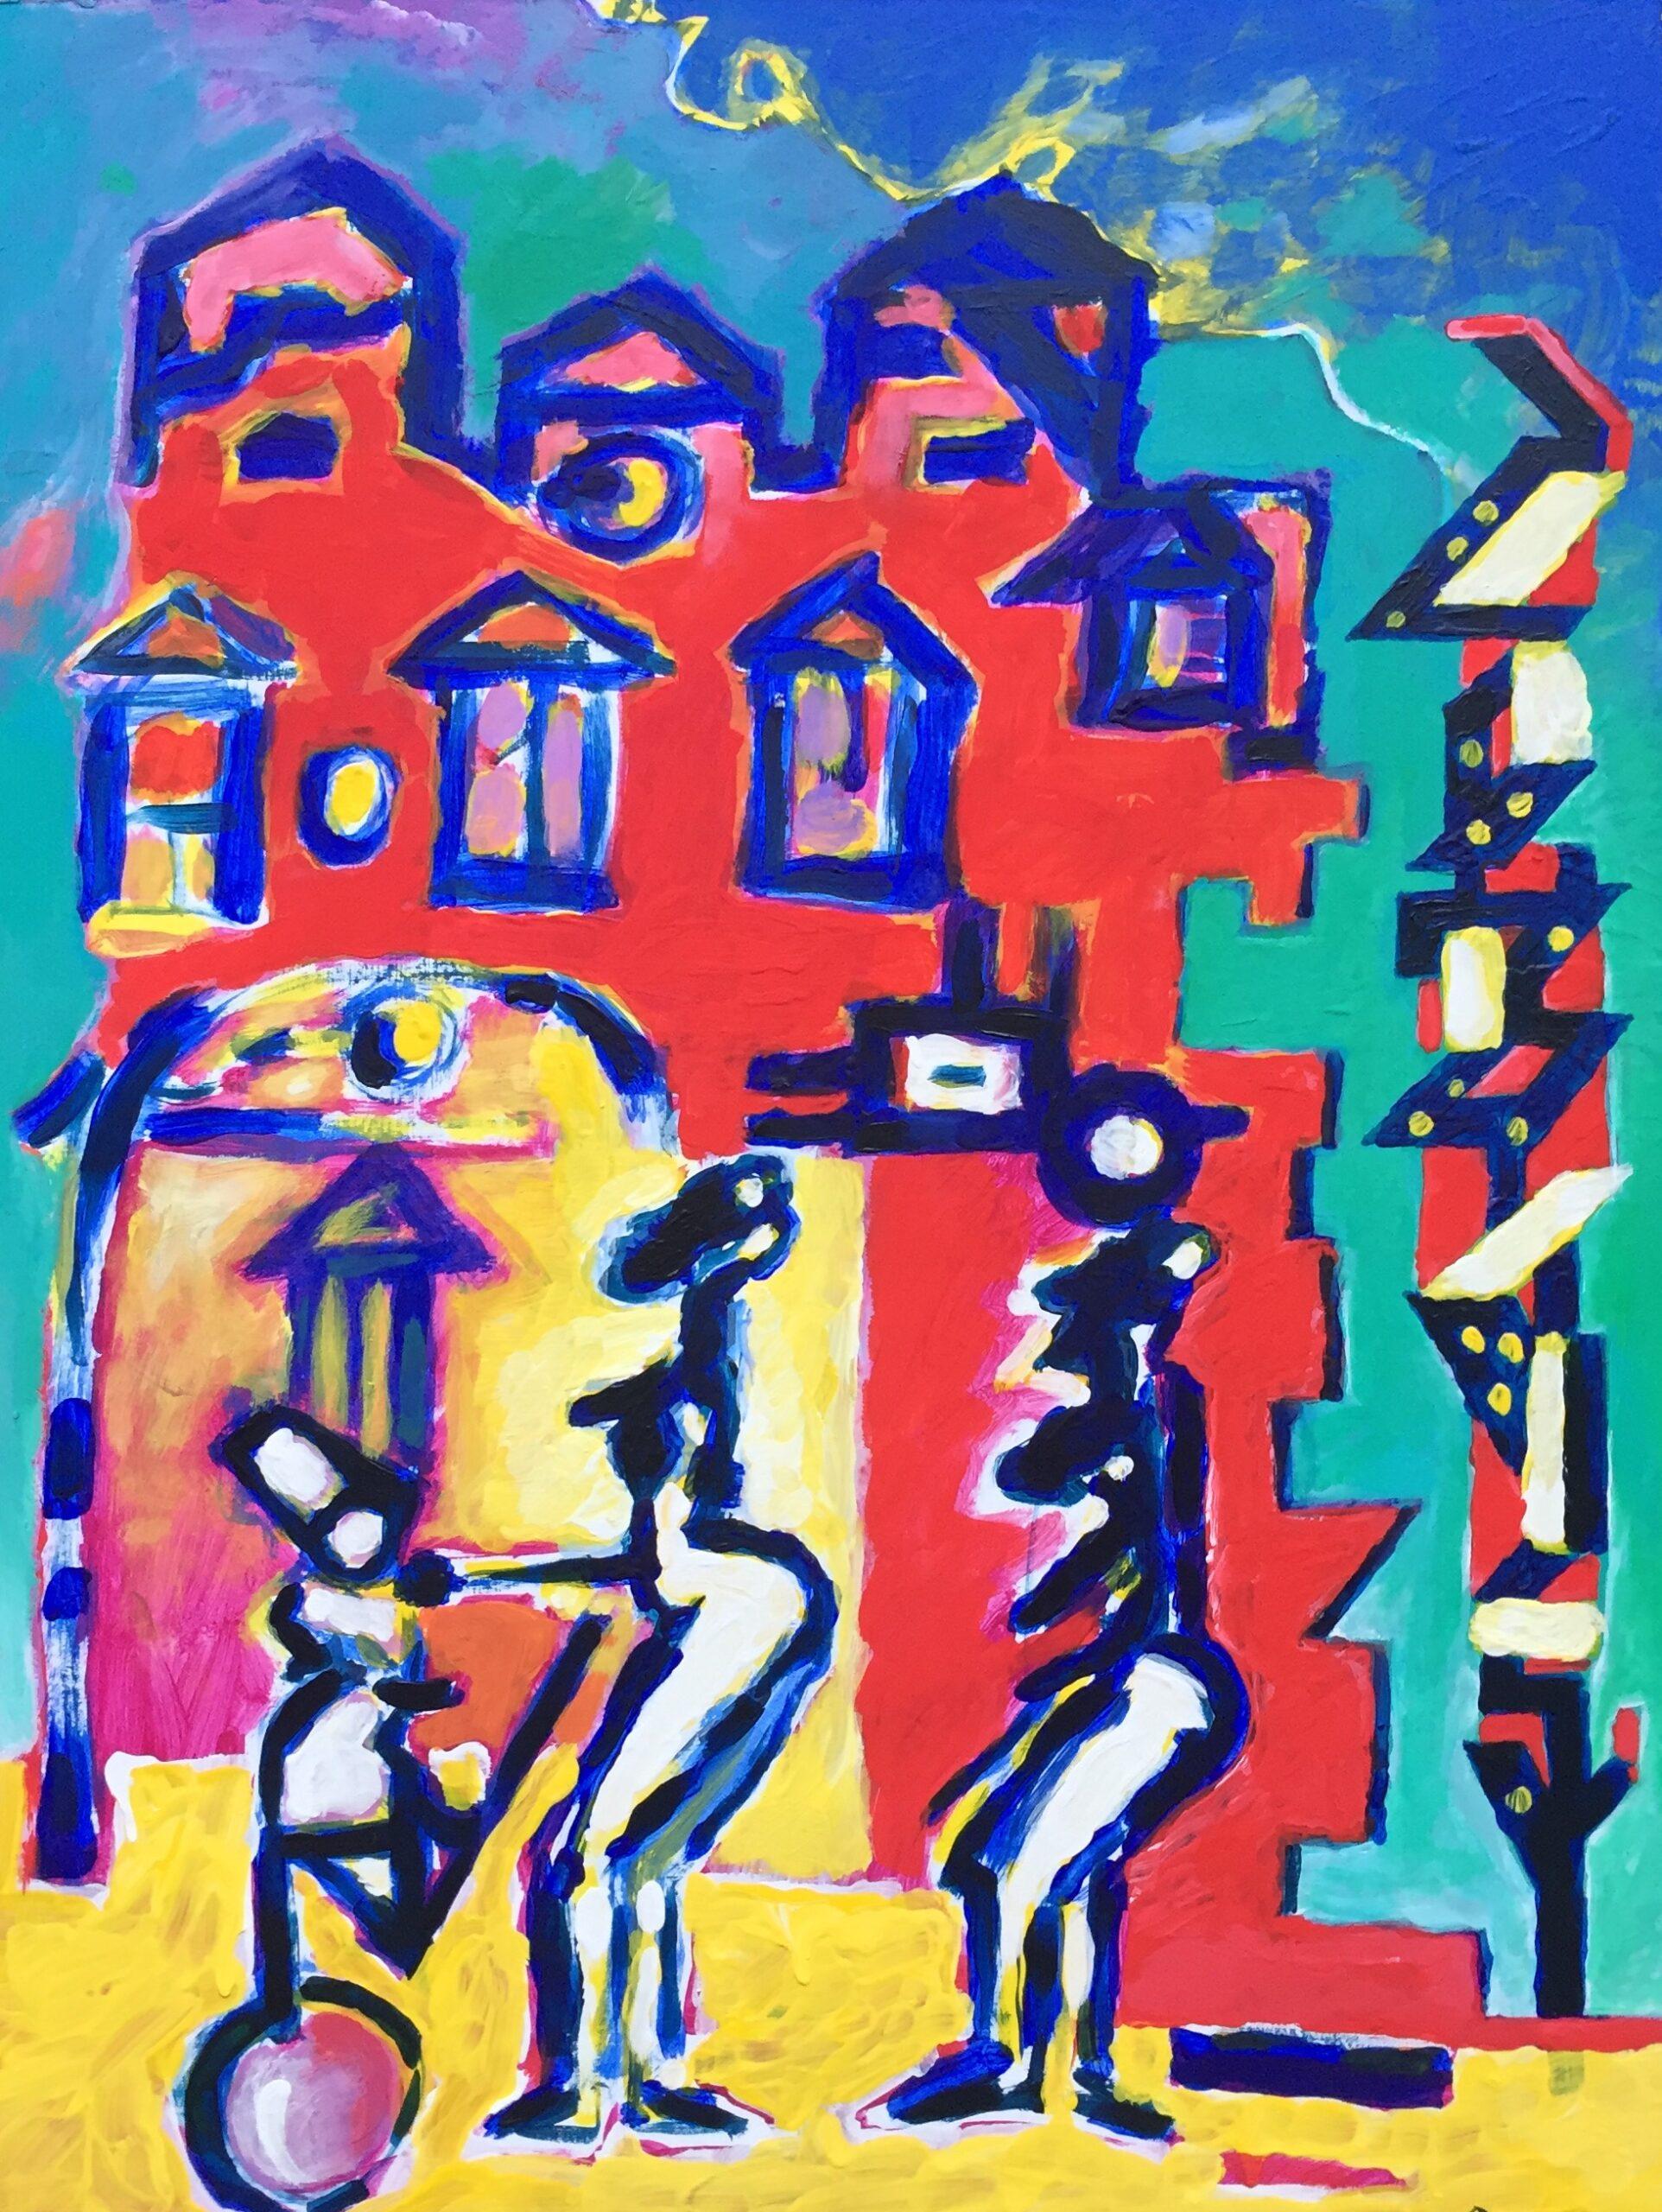 ROTES HAUS, 60x80, Acryl auf Pappe, 2010